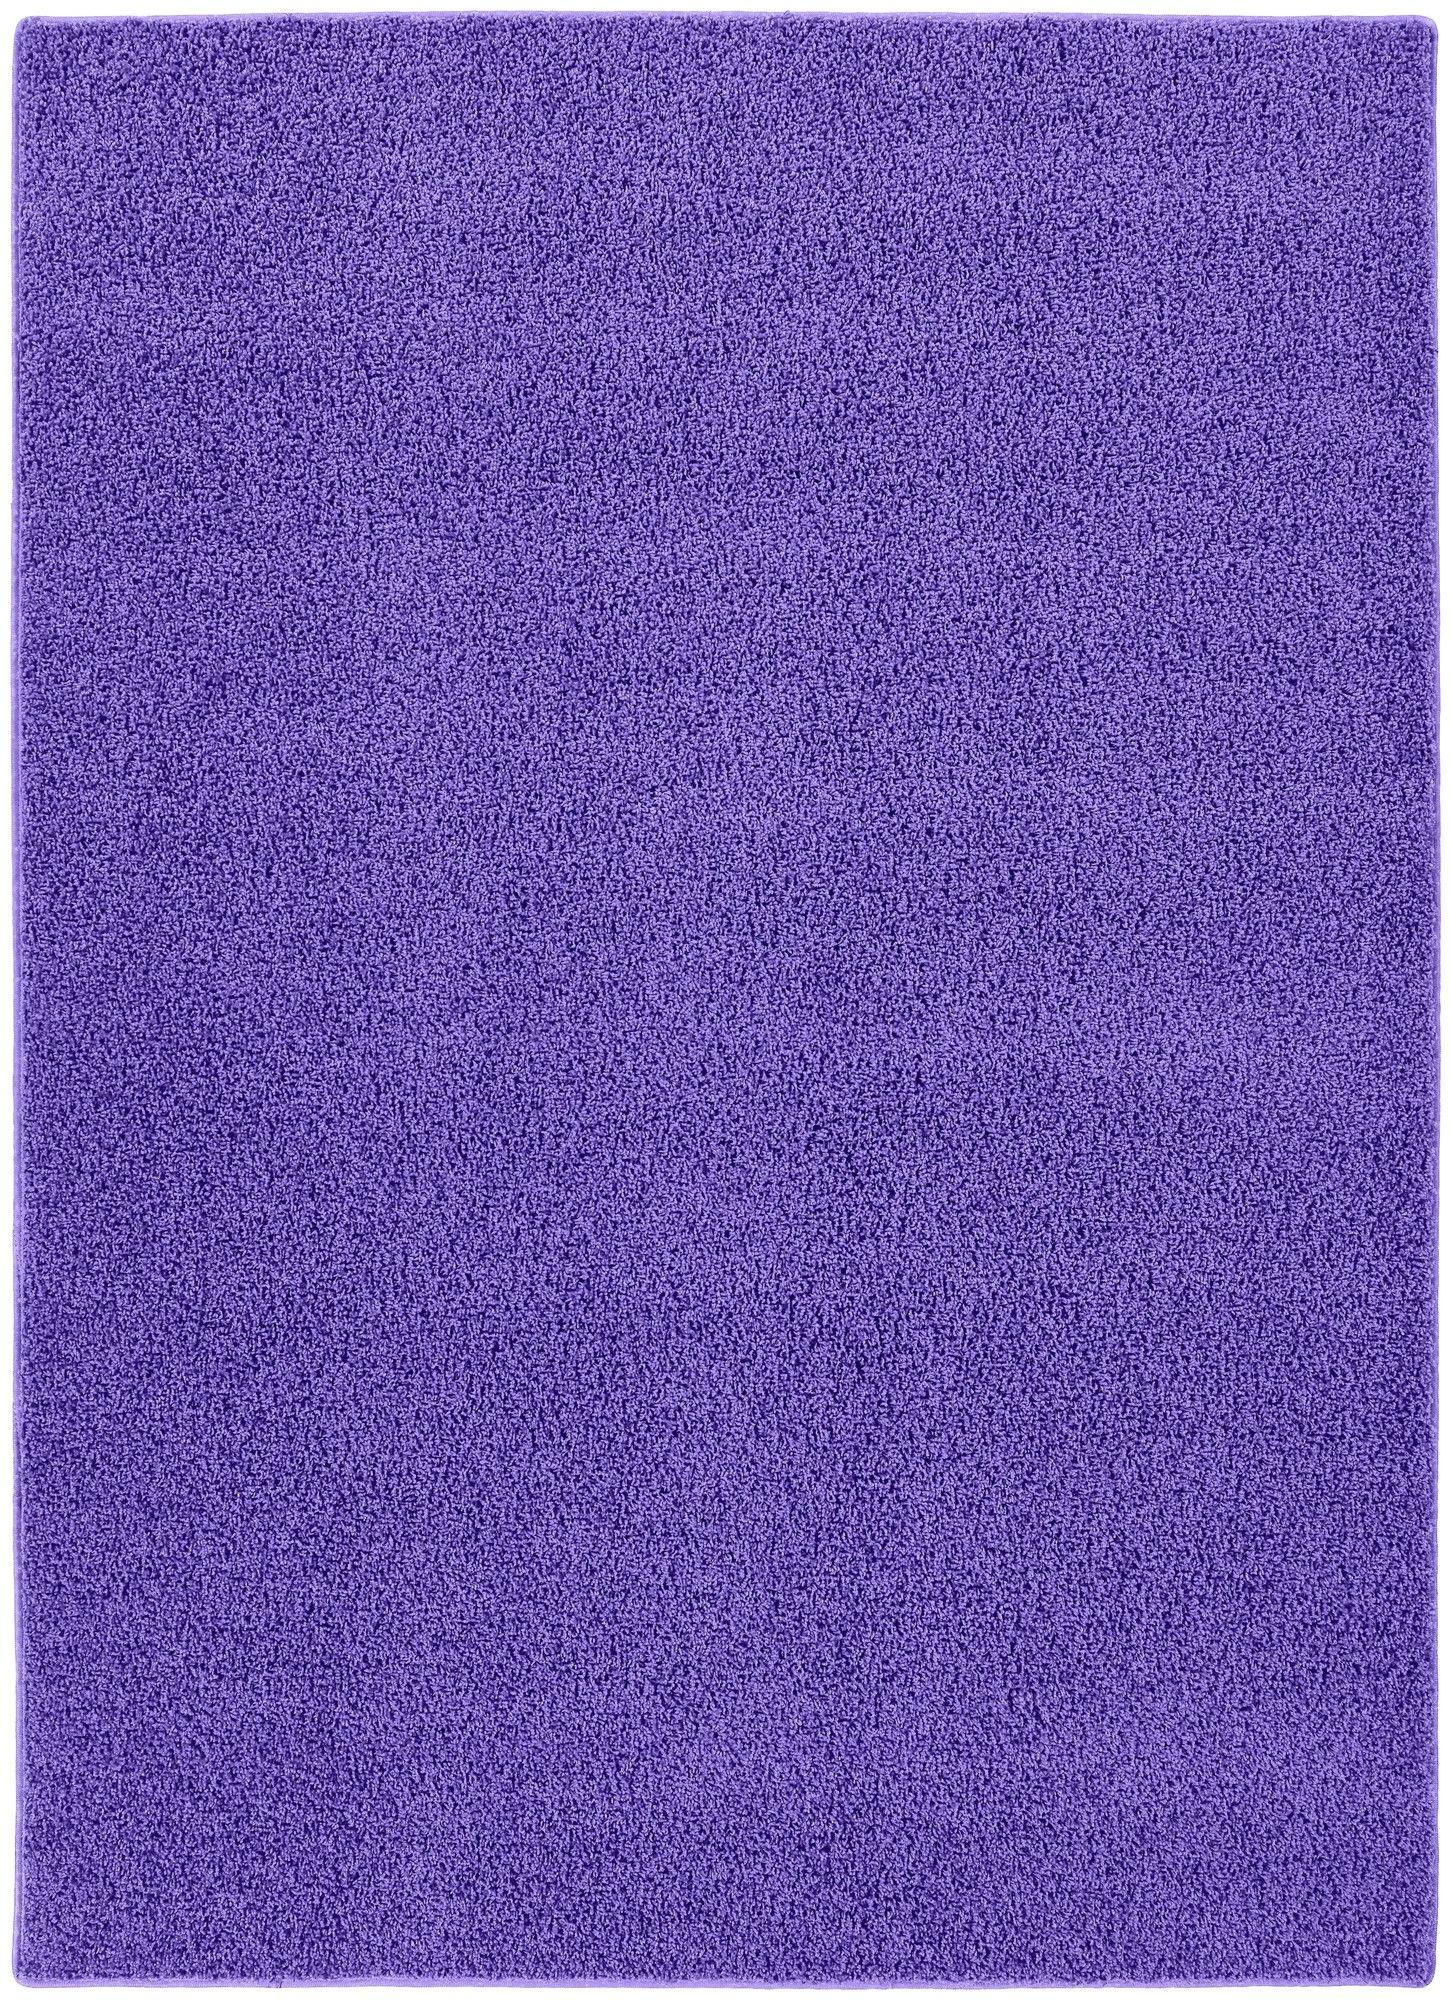 Tabitha Purple Area Rug Purple Area Rugs Area Rugs Garland Rug